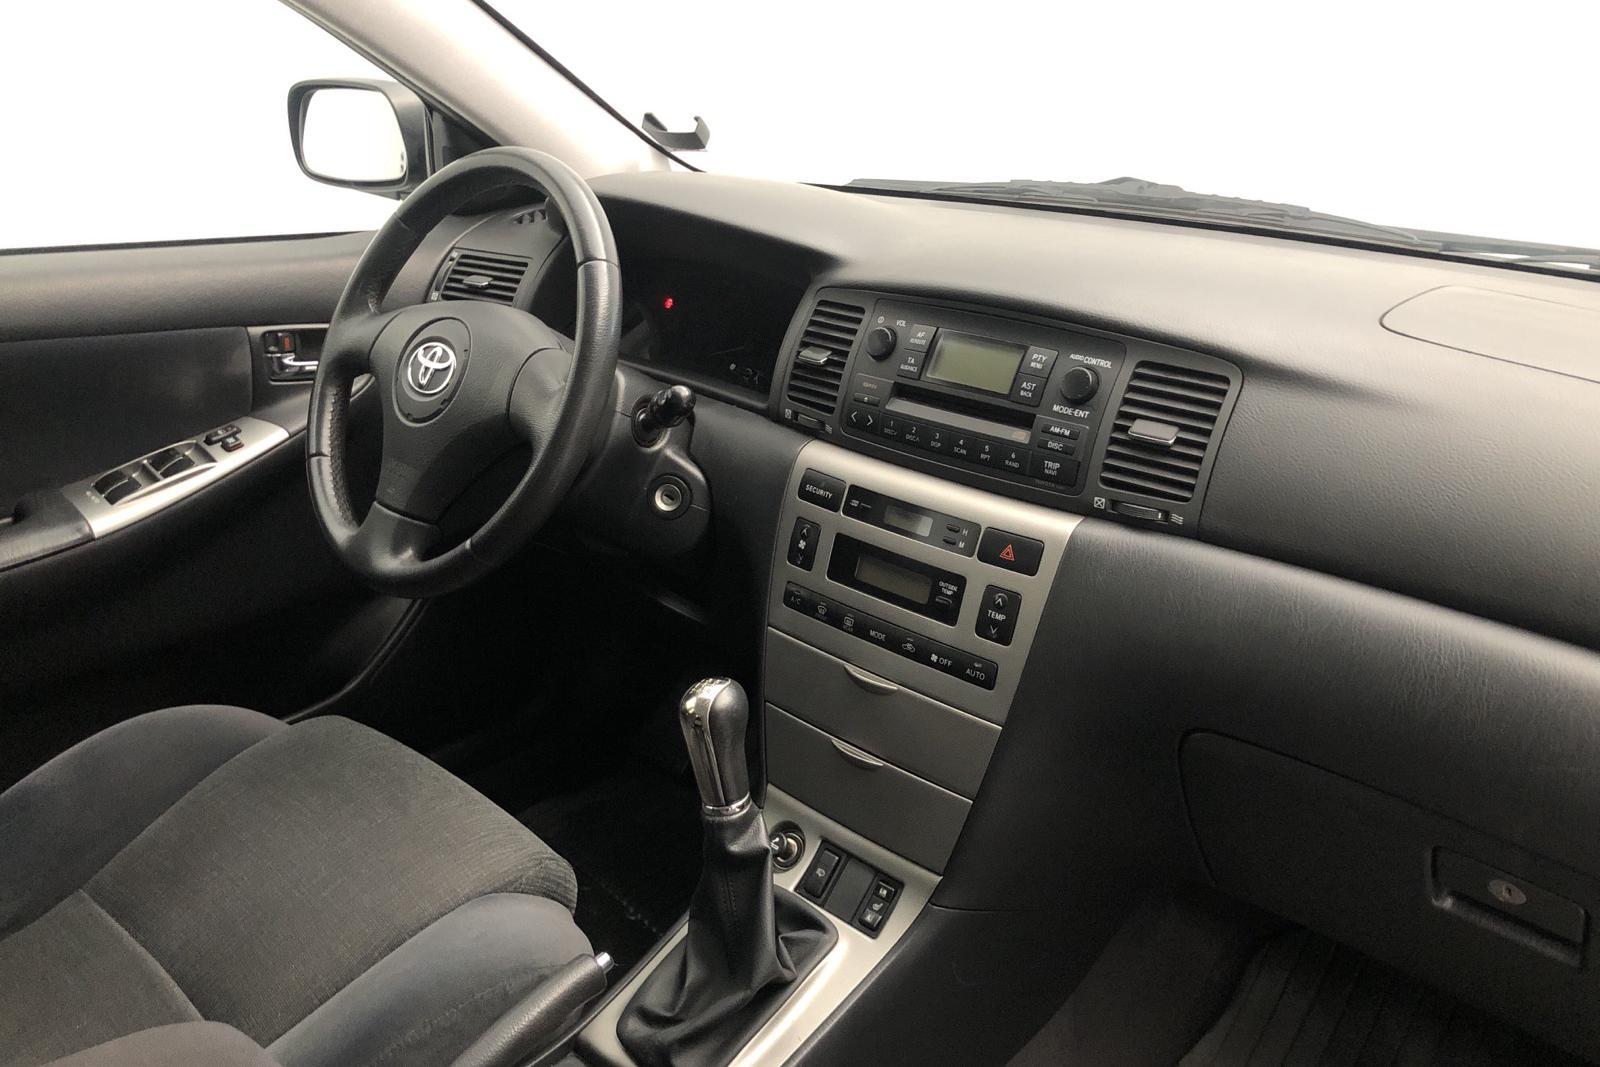 Toyota Corolla 1.6 Touring (110hk) - 137 000 km - Manual - blue - 2003